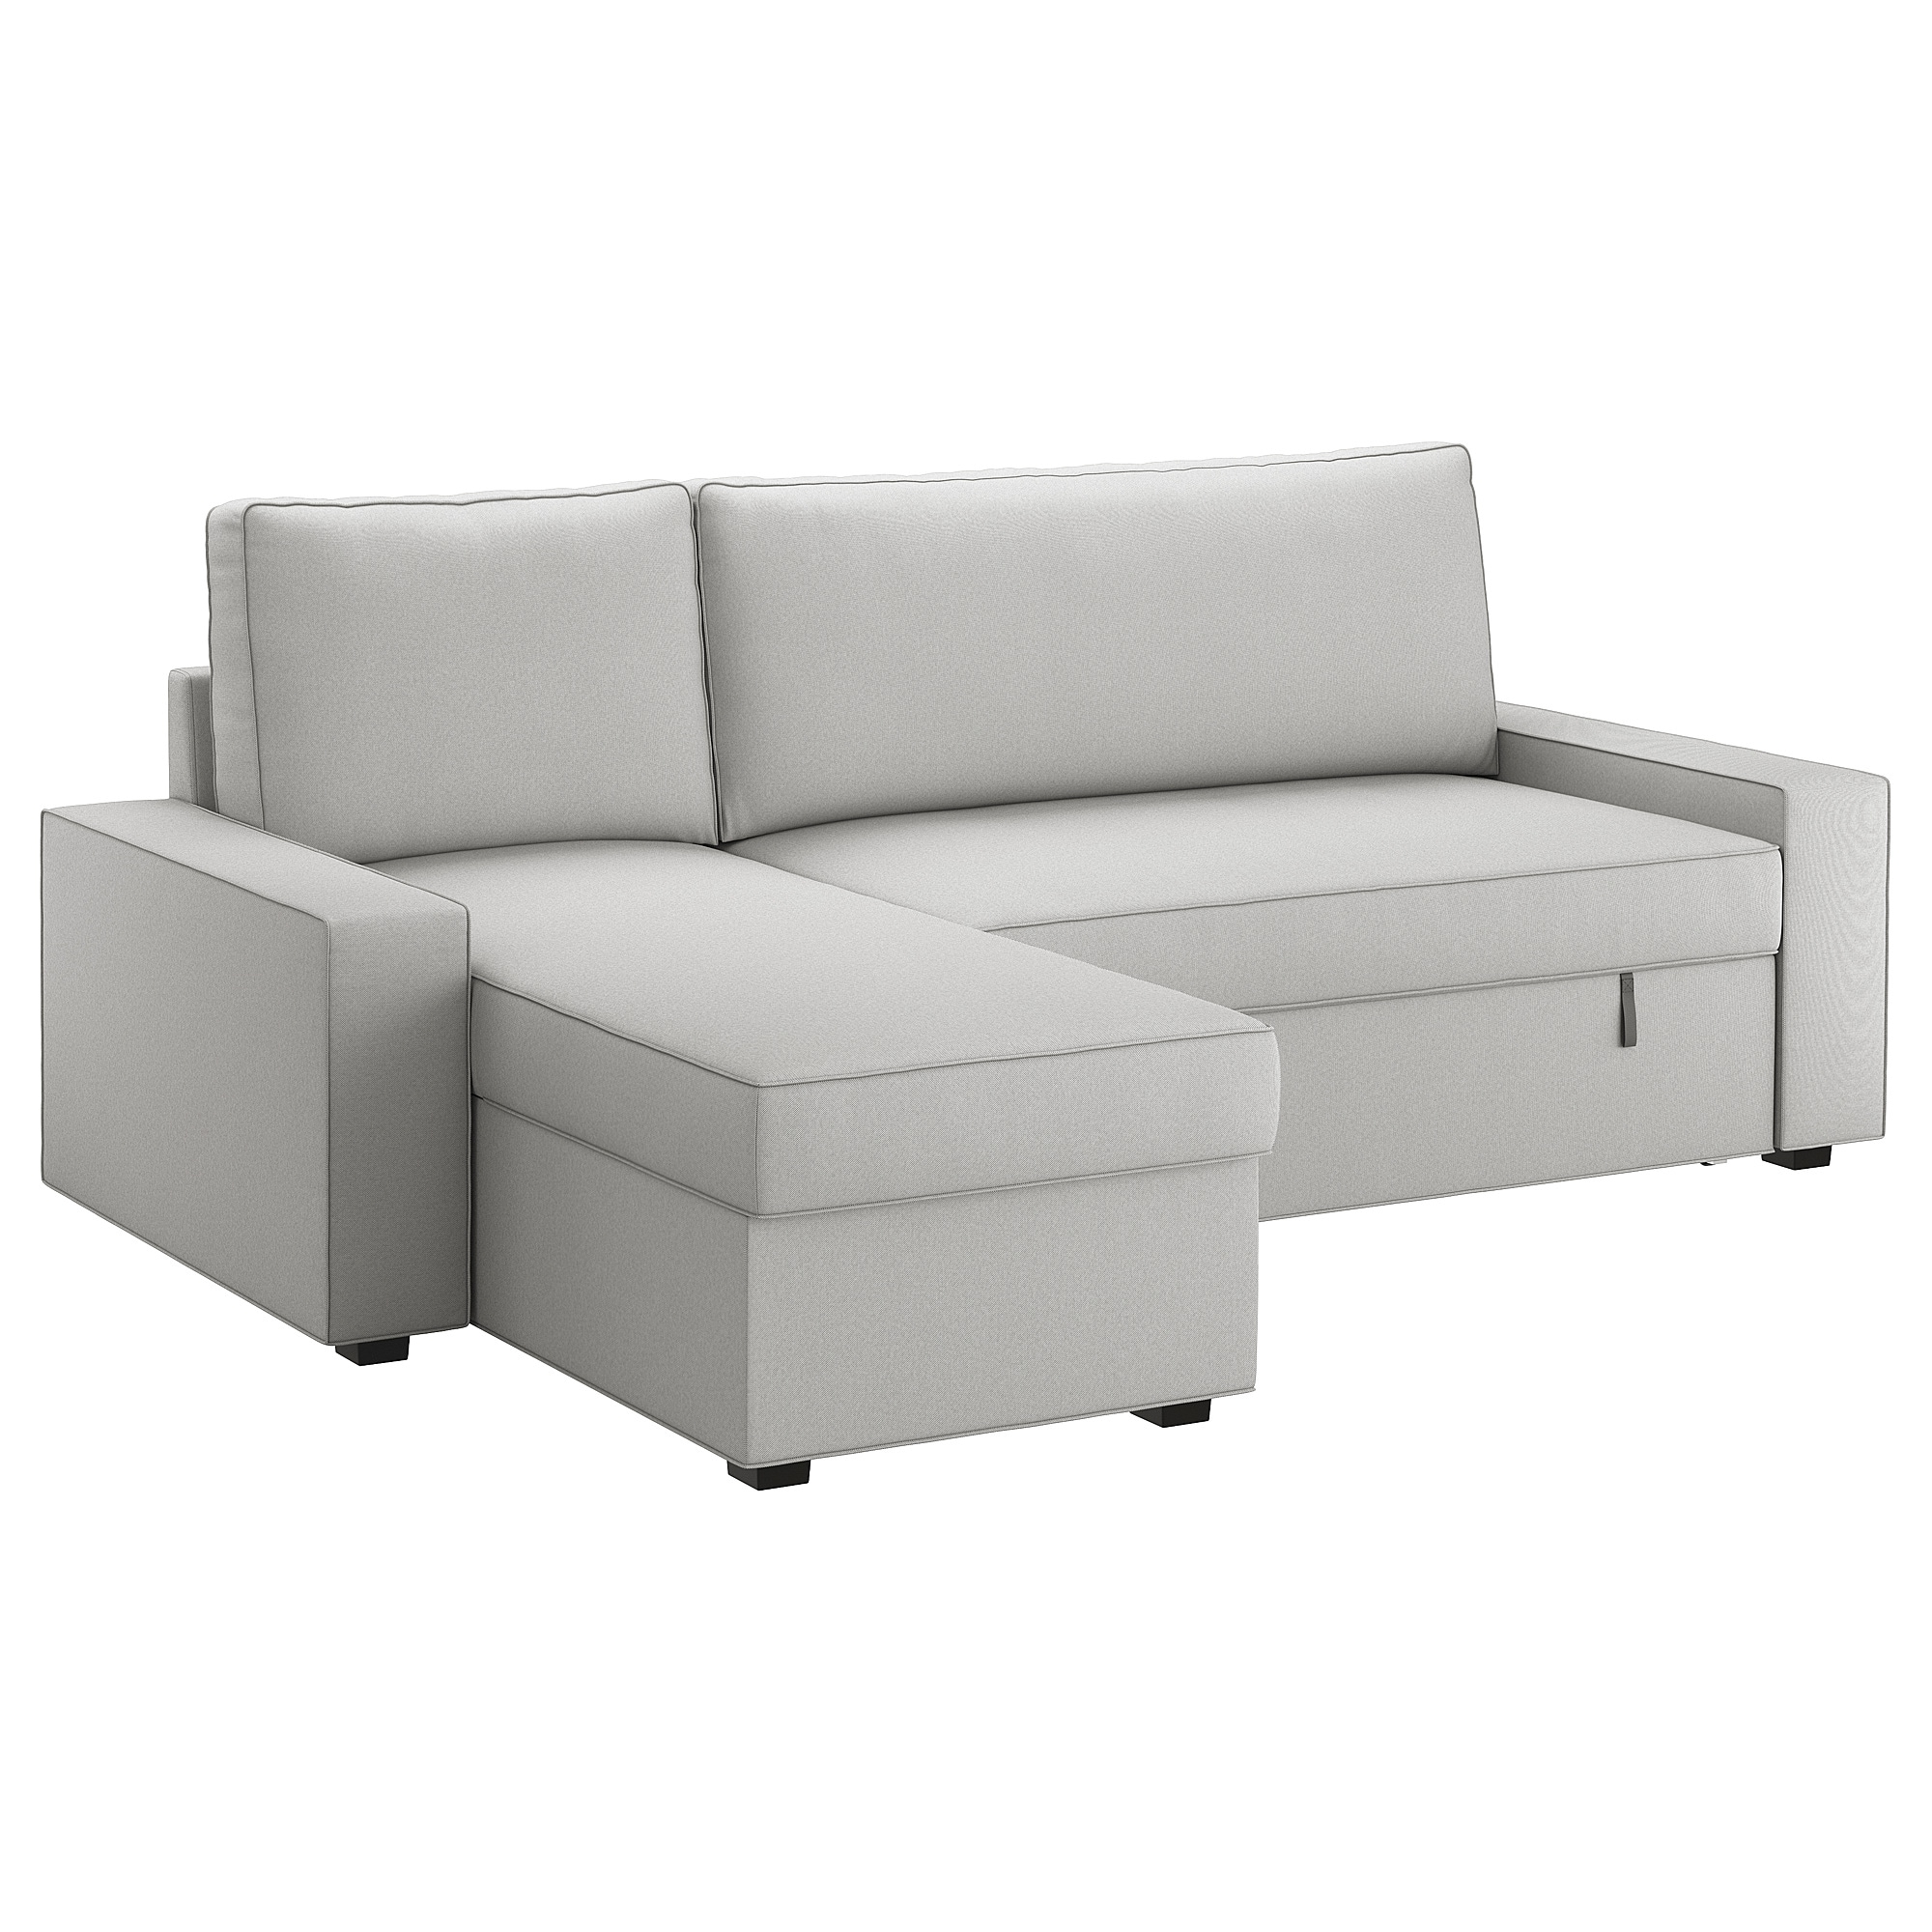 Sofas Cama 0gdr Vilasund sofà Cama Con Chaiselongue orrsta Gris Claro Ikea